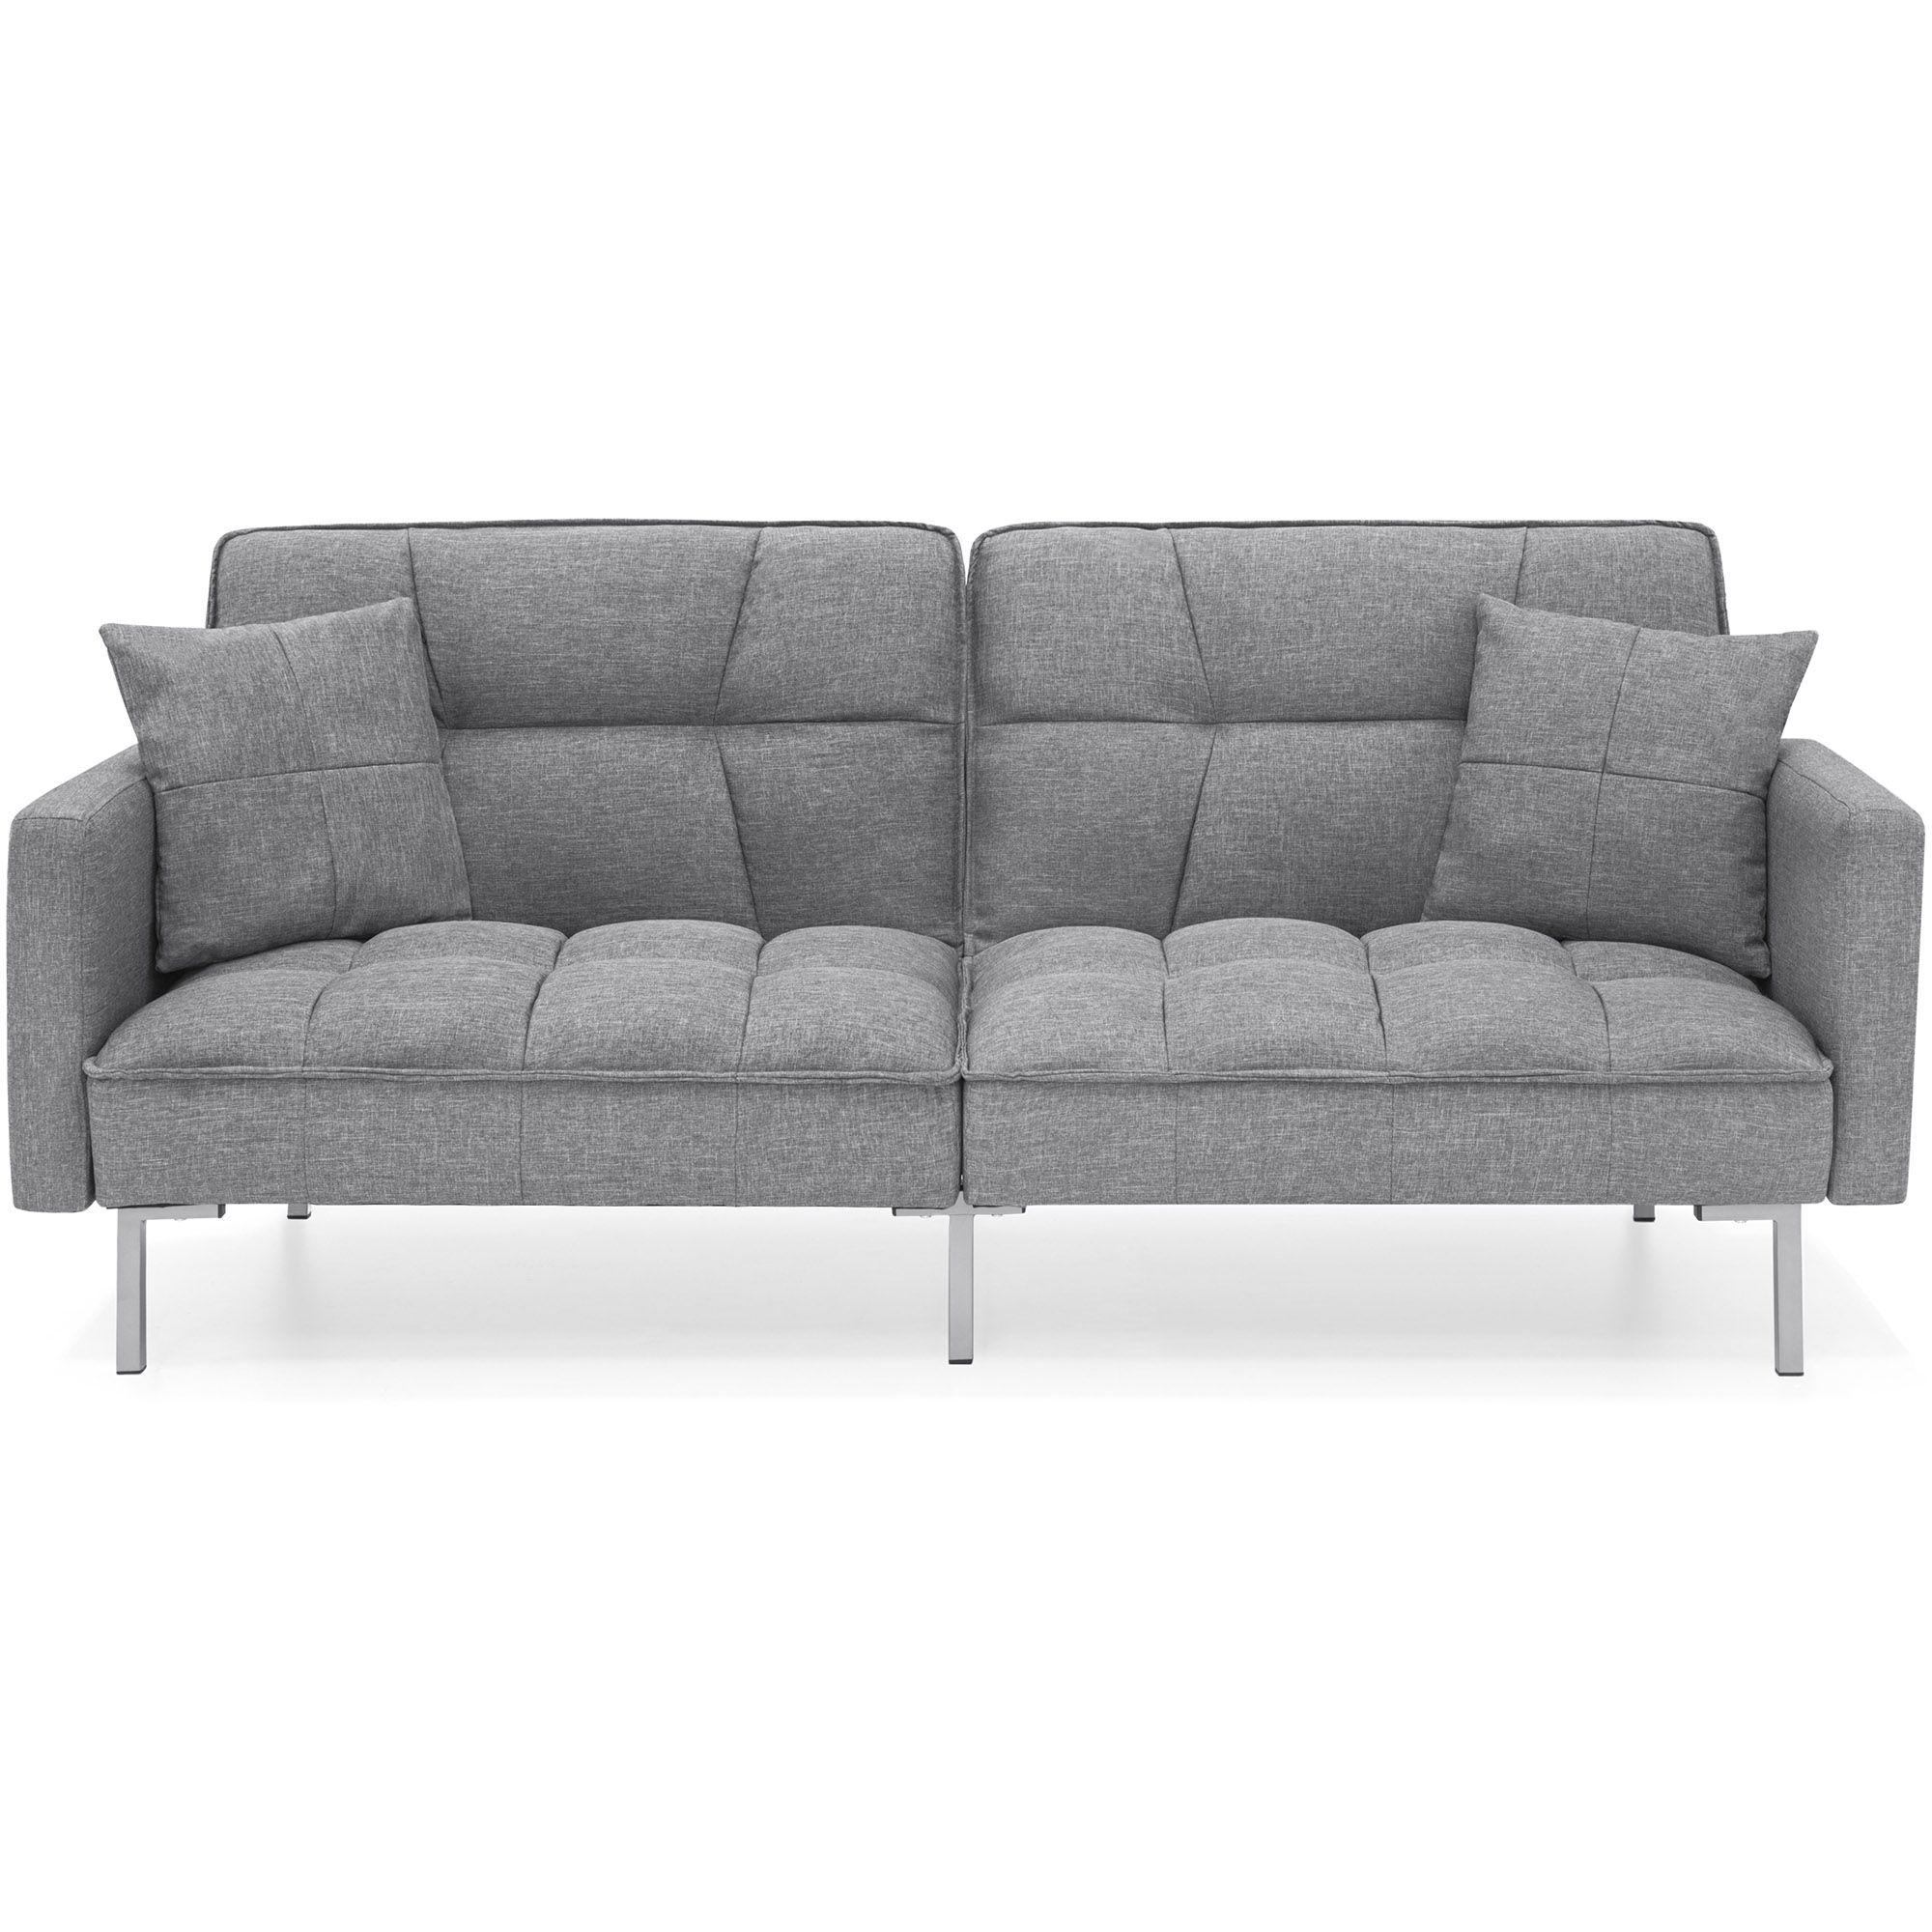 Home in 2020 Futon, Futon sofa, Futon couch